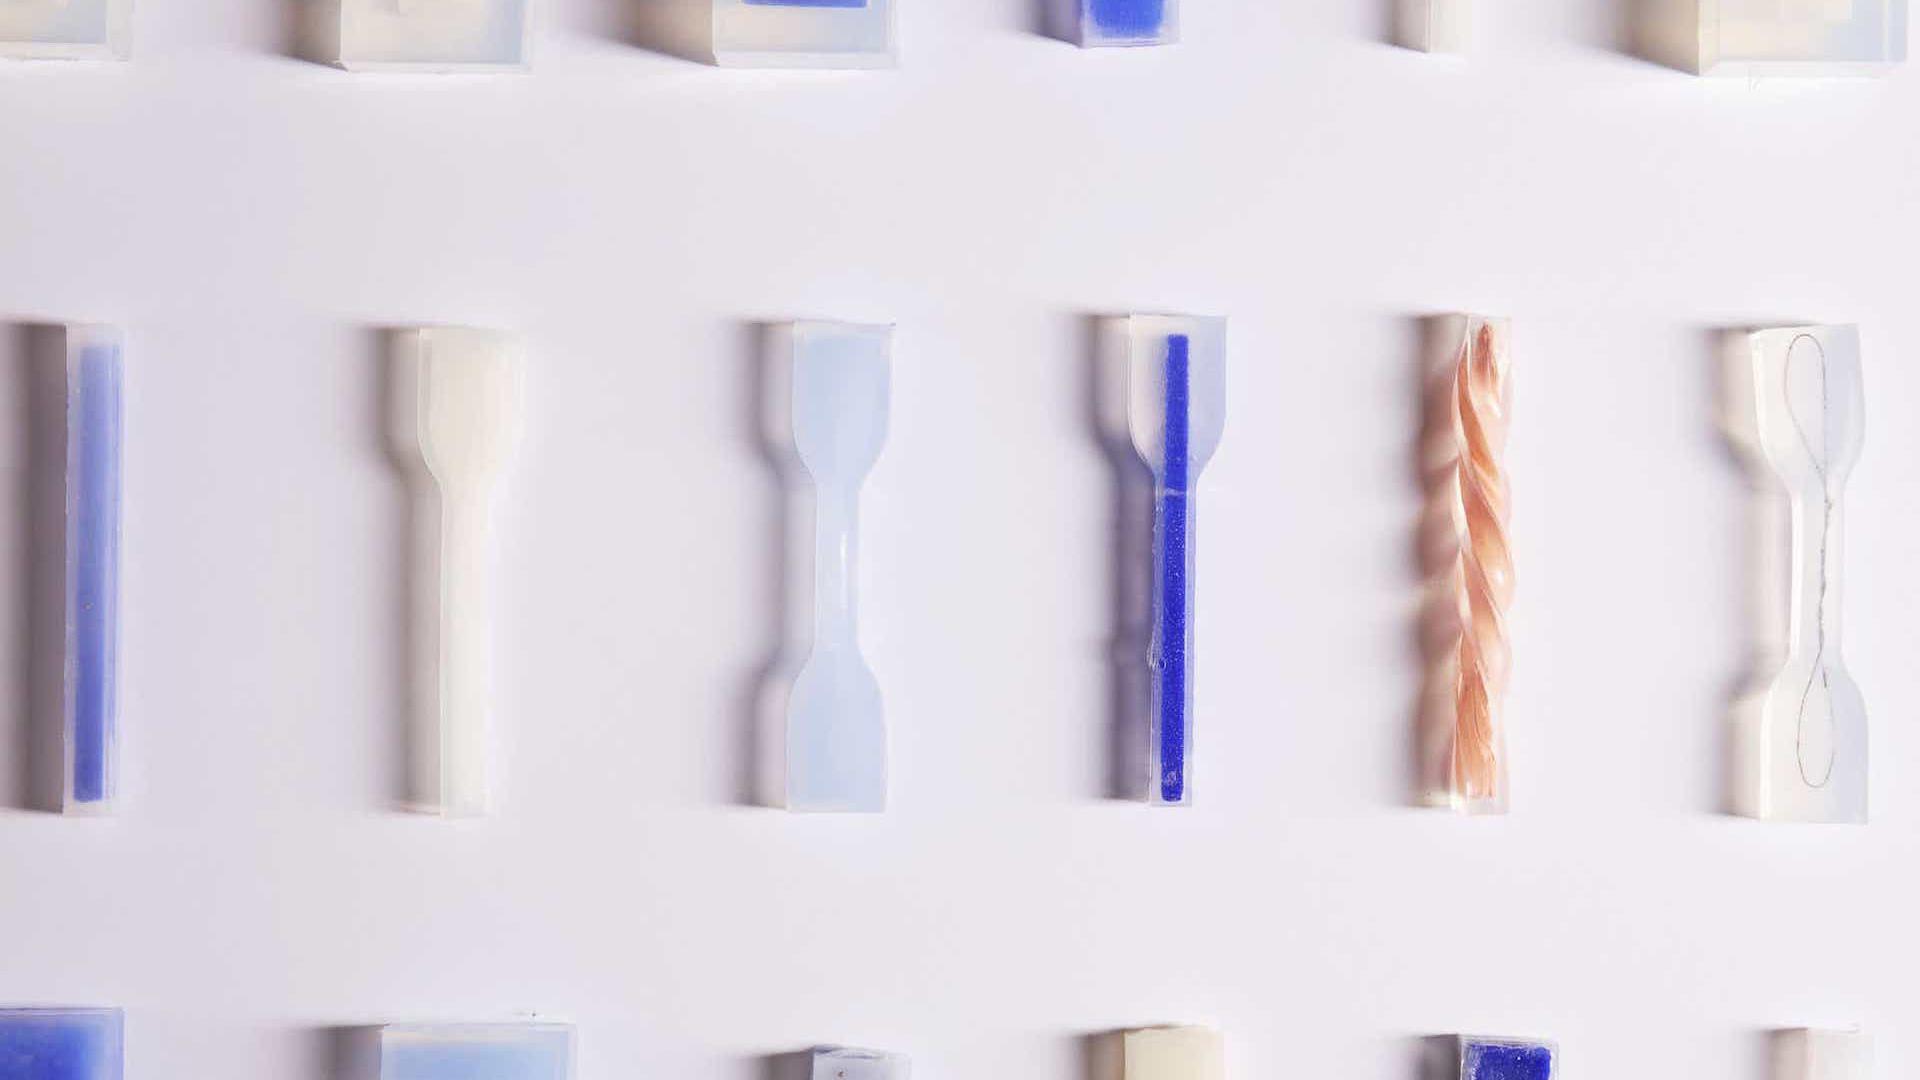 reflex-samples-01-2